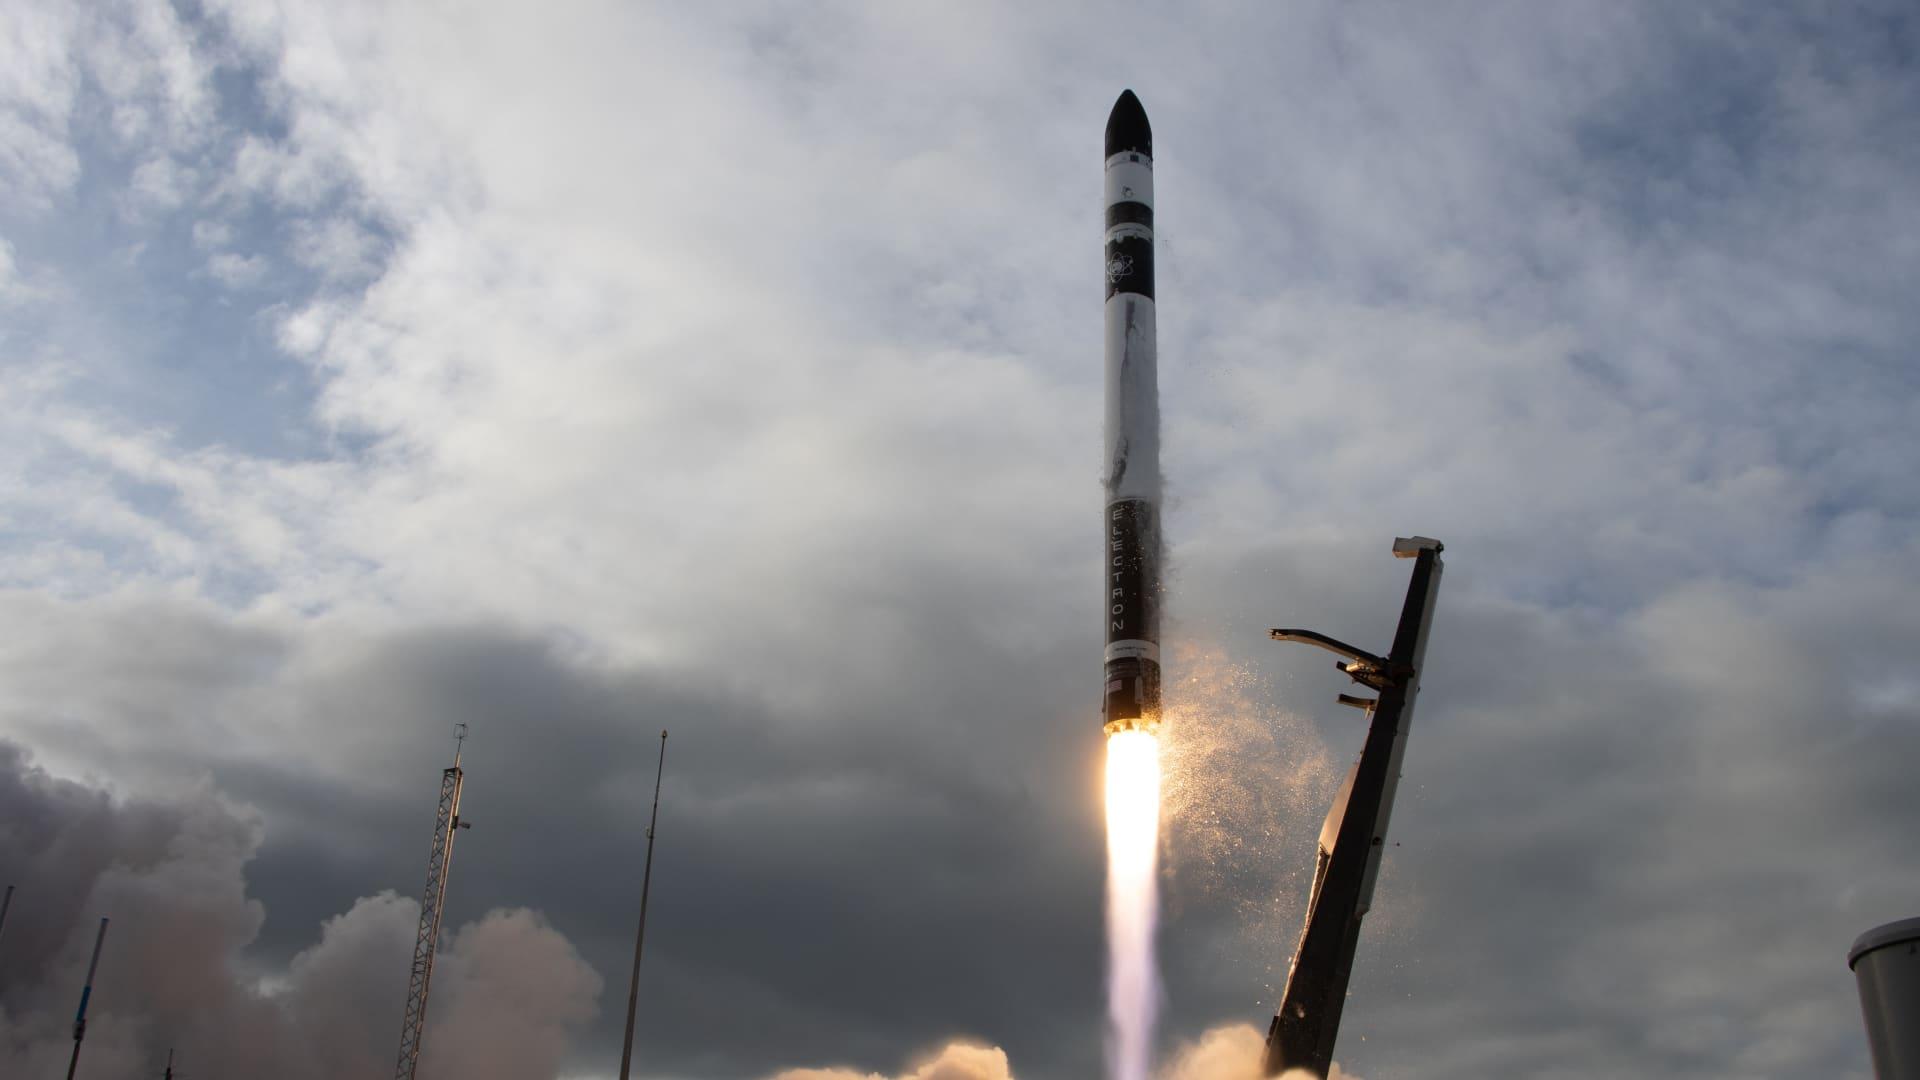 Rocket Lab's Electron rocket lifts off on July 4, 2020.